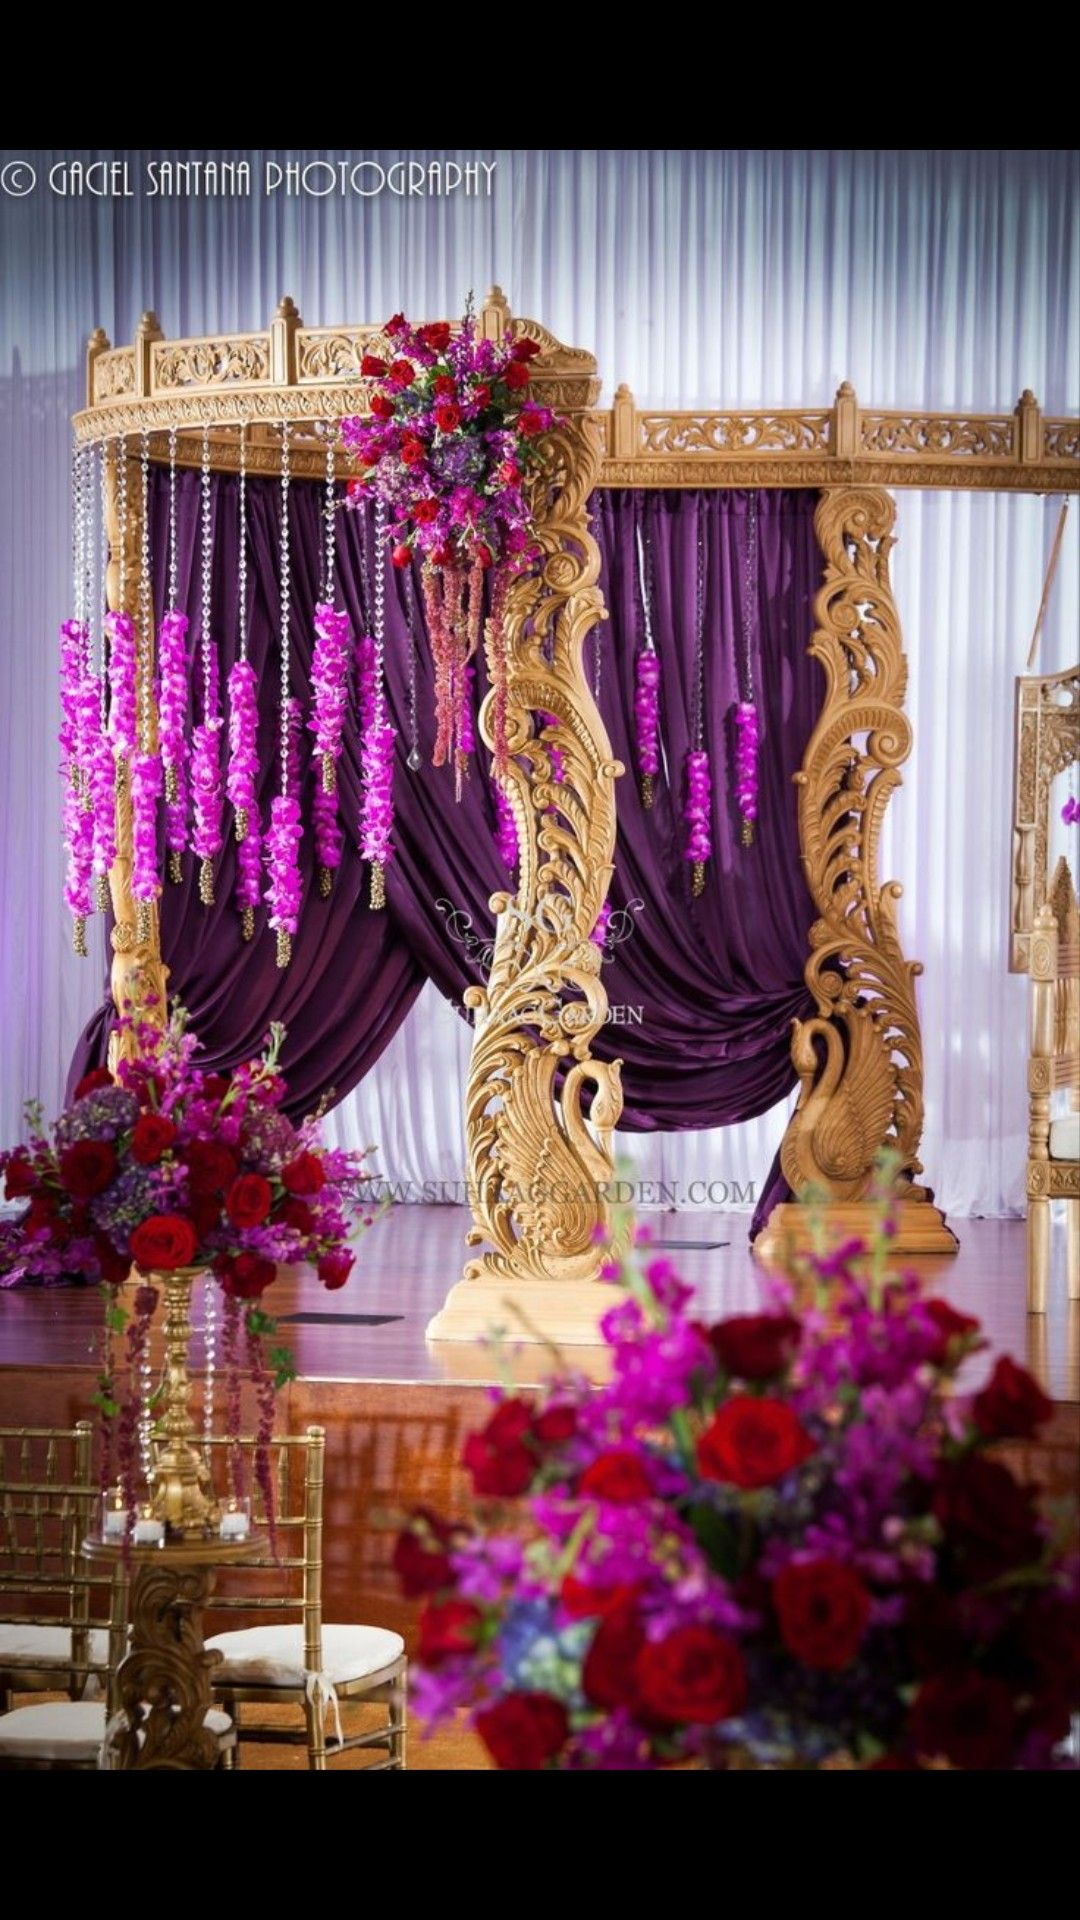 Wedding stage decoration delhi  Pin by Reena Kotecha on Wedding Decor  Pinterest  Wedding